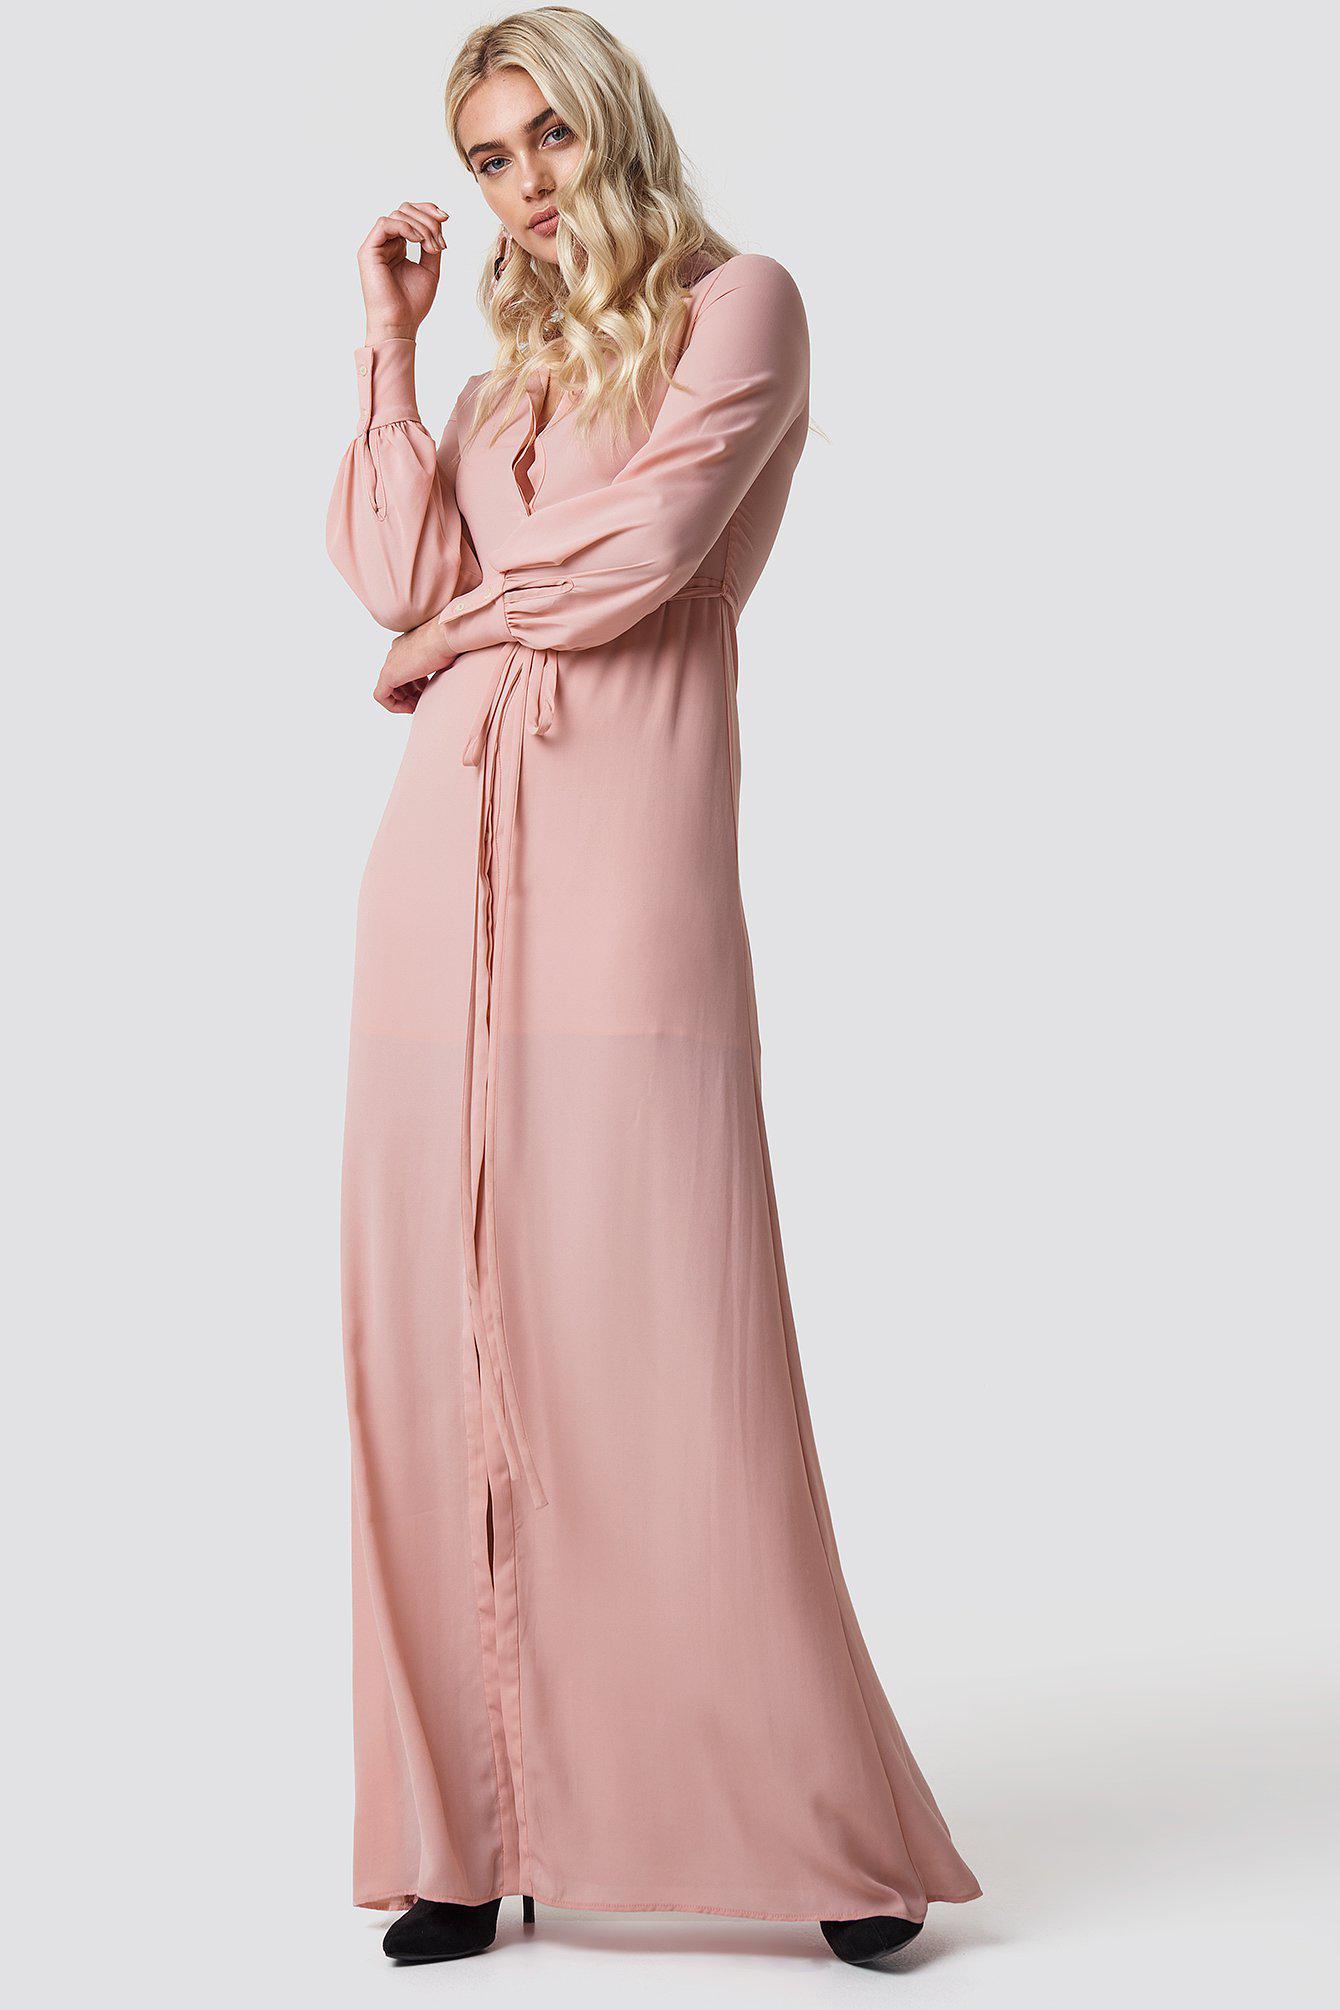 99e4d9d43a6 Mango Mia-a Maxi Dress Pastel Pink in Pink - Lyst